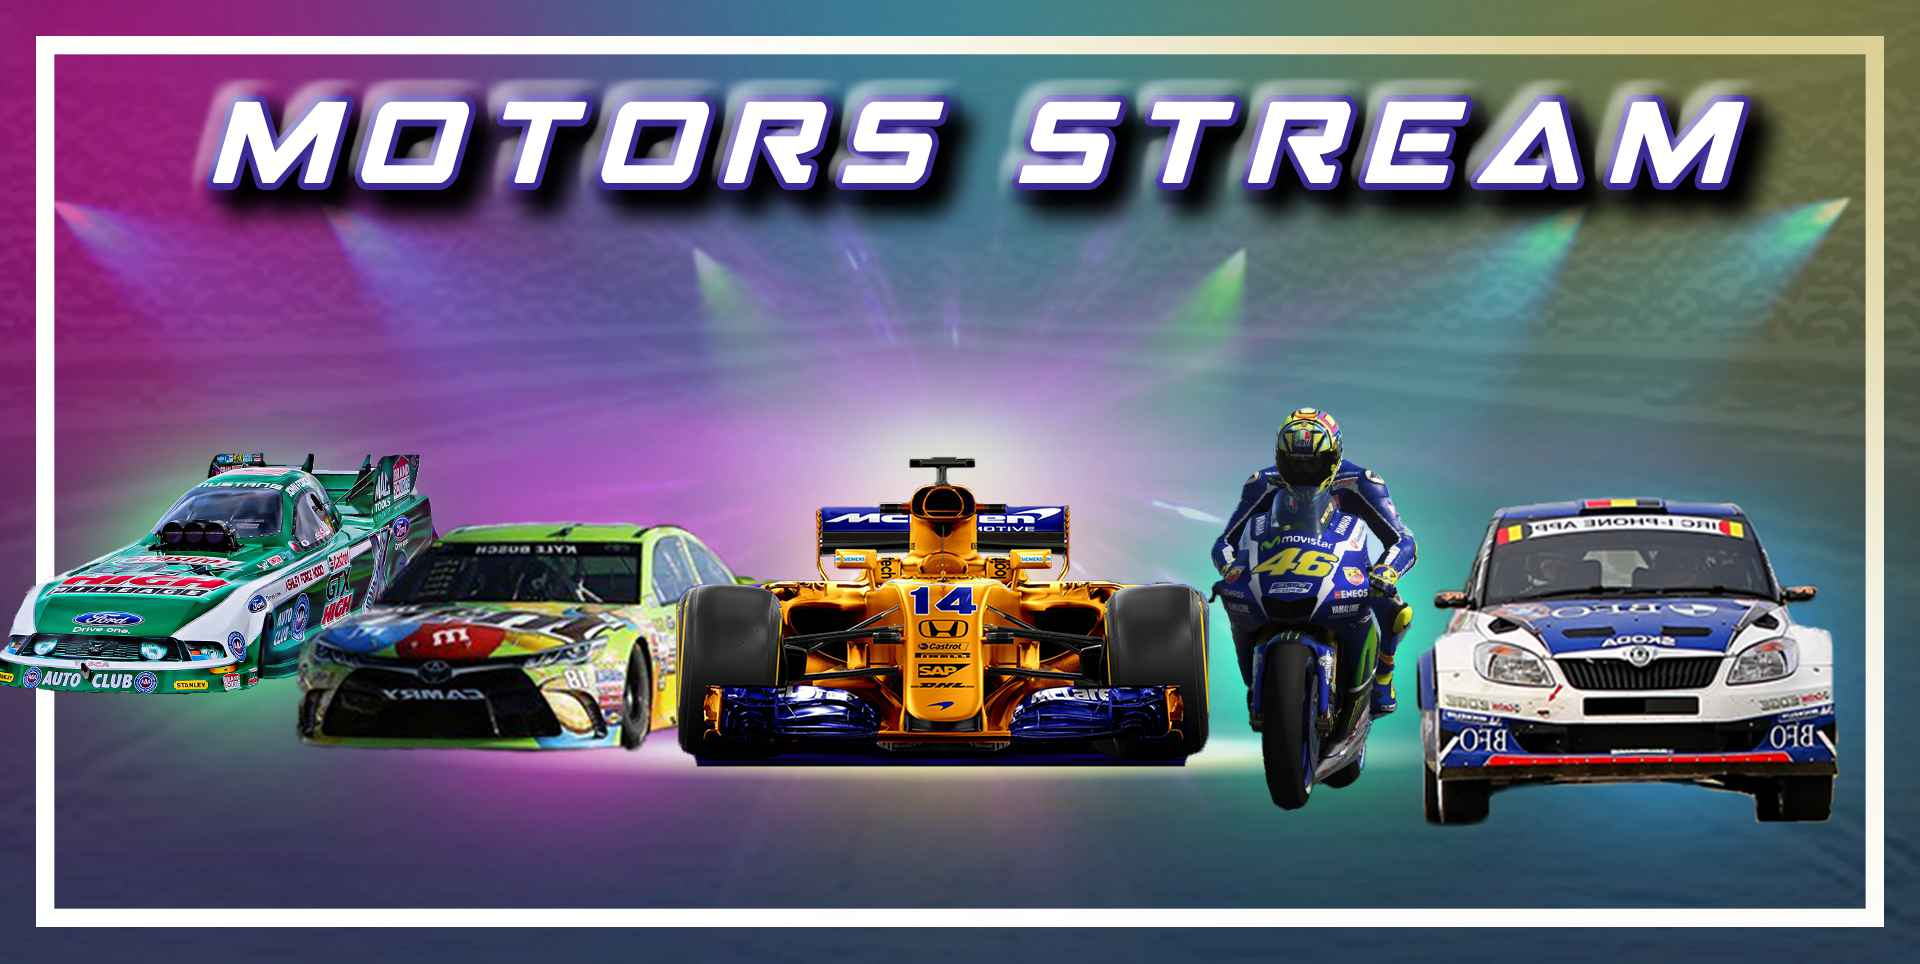 F1 Bahrain Grand Prix 2018 Live